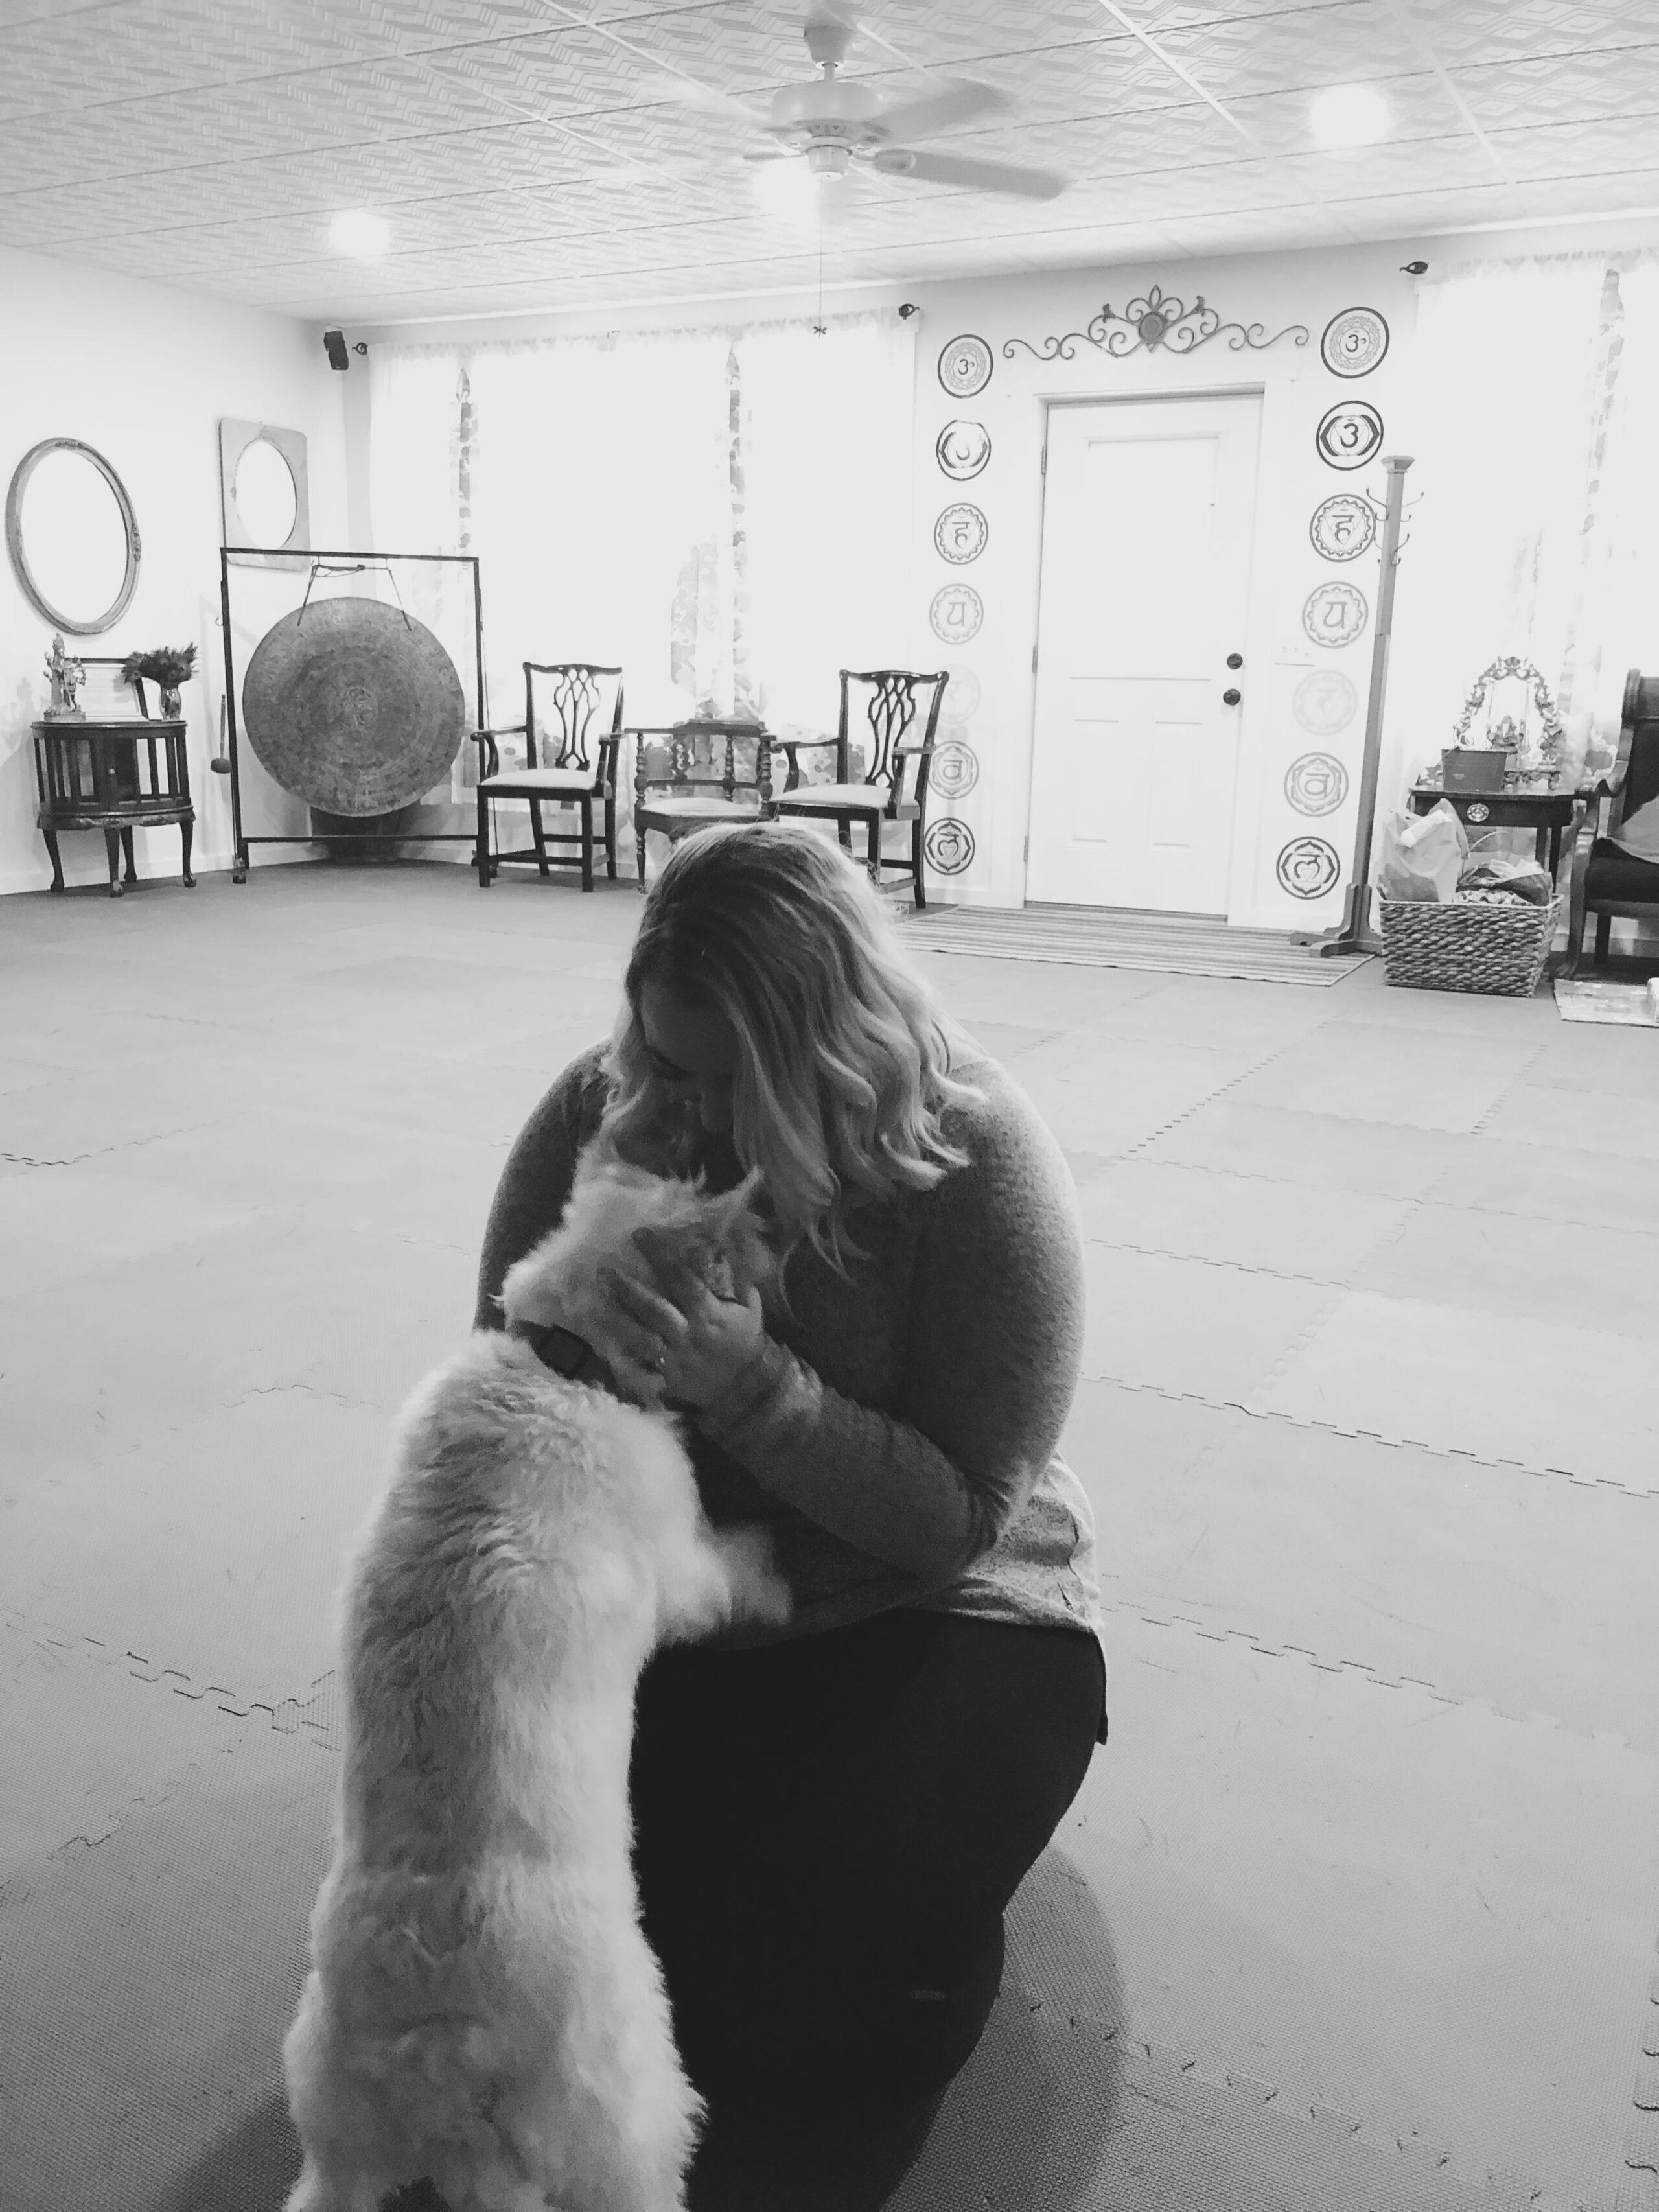 Ashley Price snuggling the dog, Bhakti